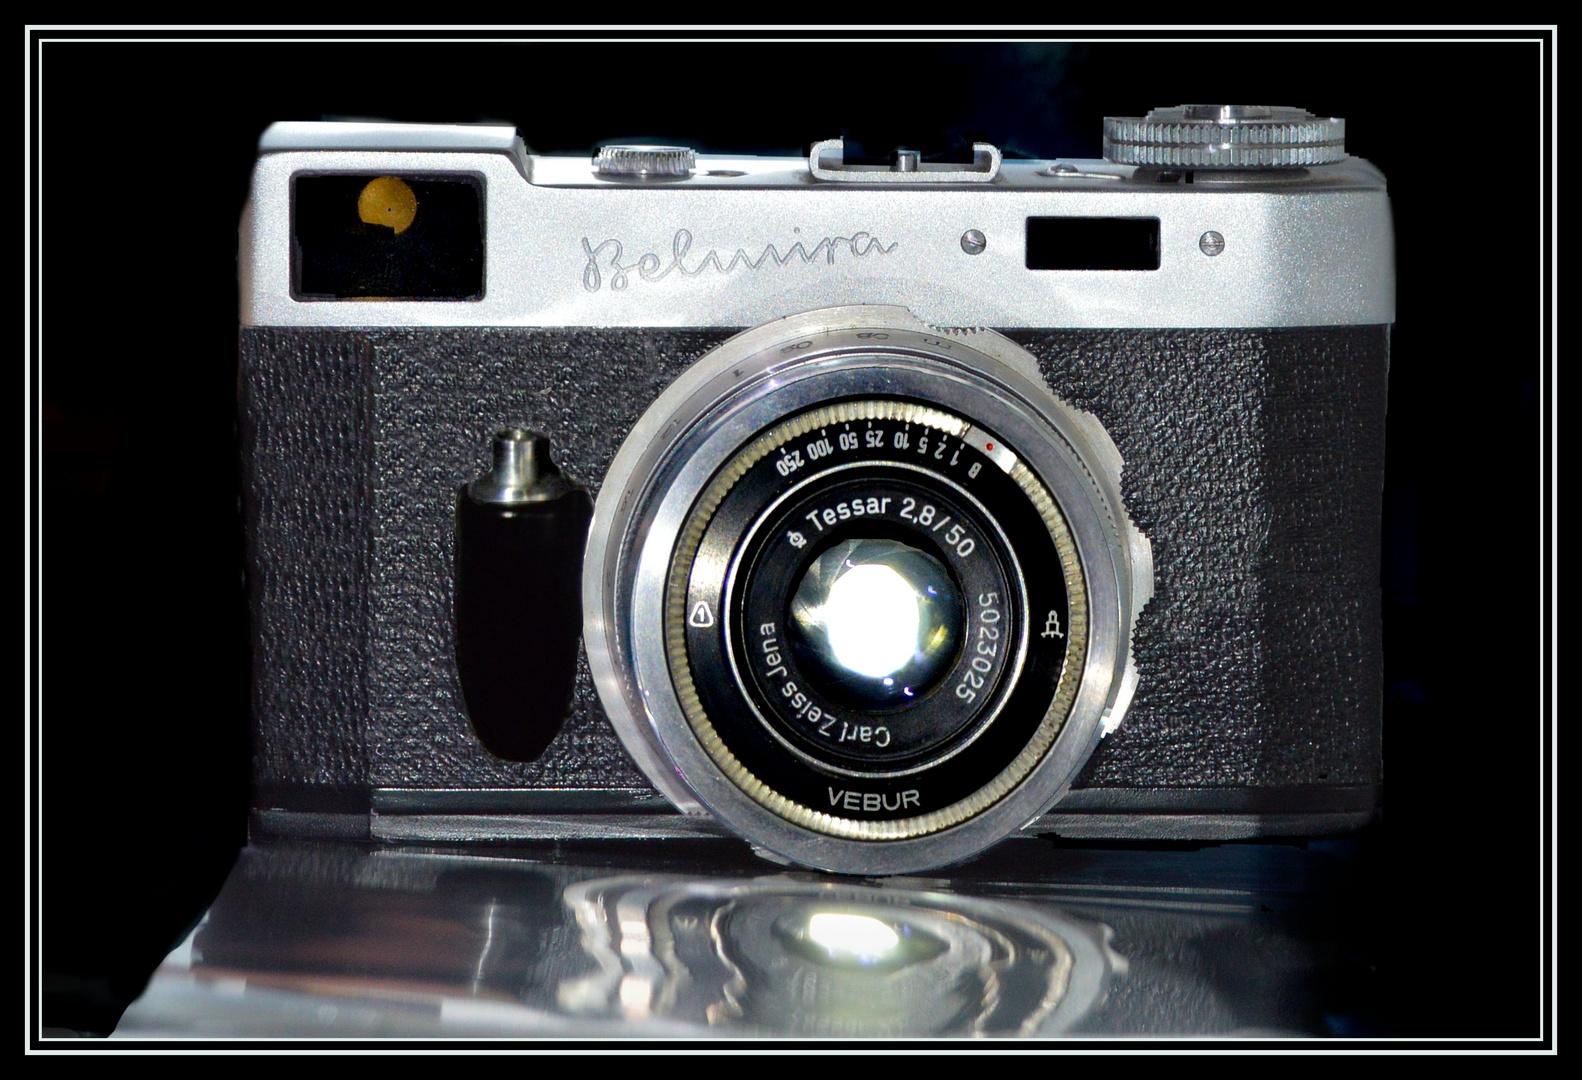 Zeiss Entfernungsmesser Nikon : Die welta belmira objektiv tessar 2 8 50 carl zeiss jena foto & bild